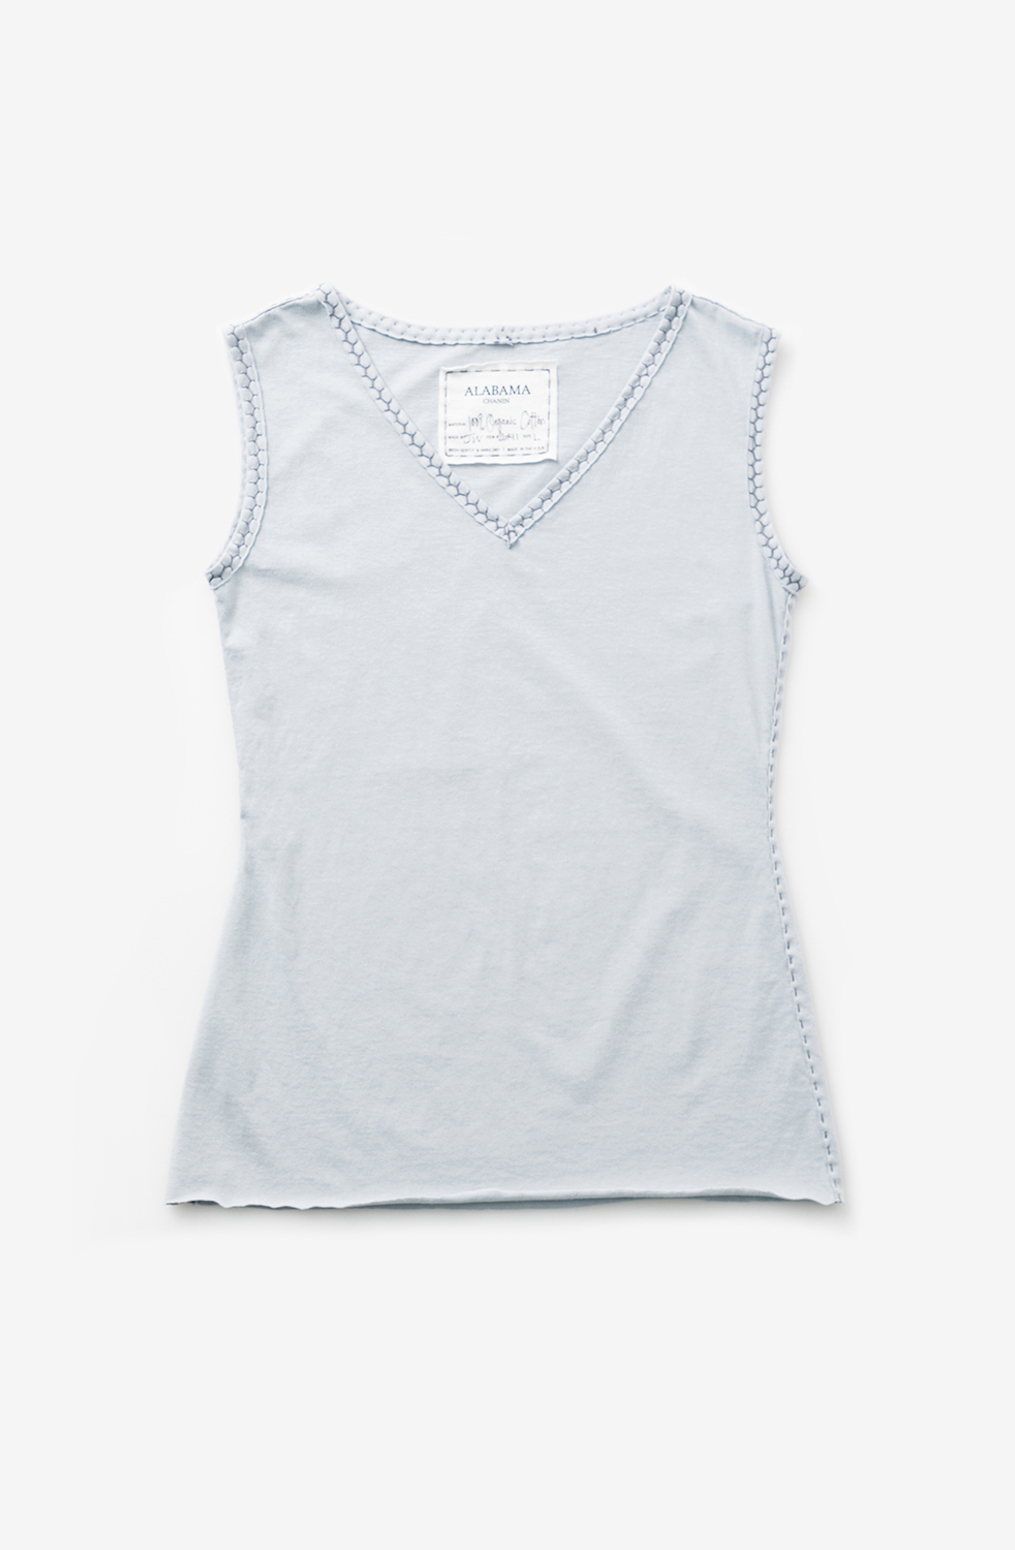 Alabama chanin womens sleeveless cotton top 1